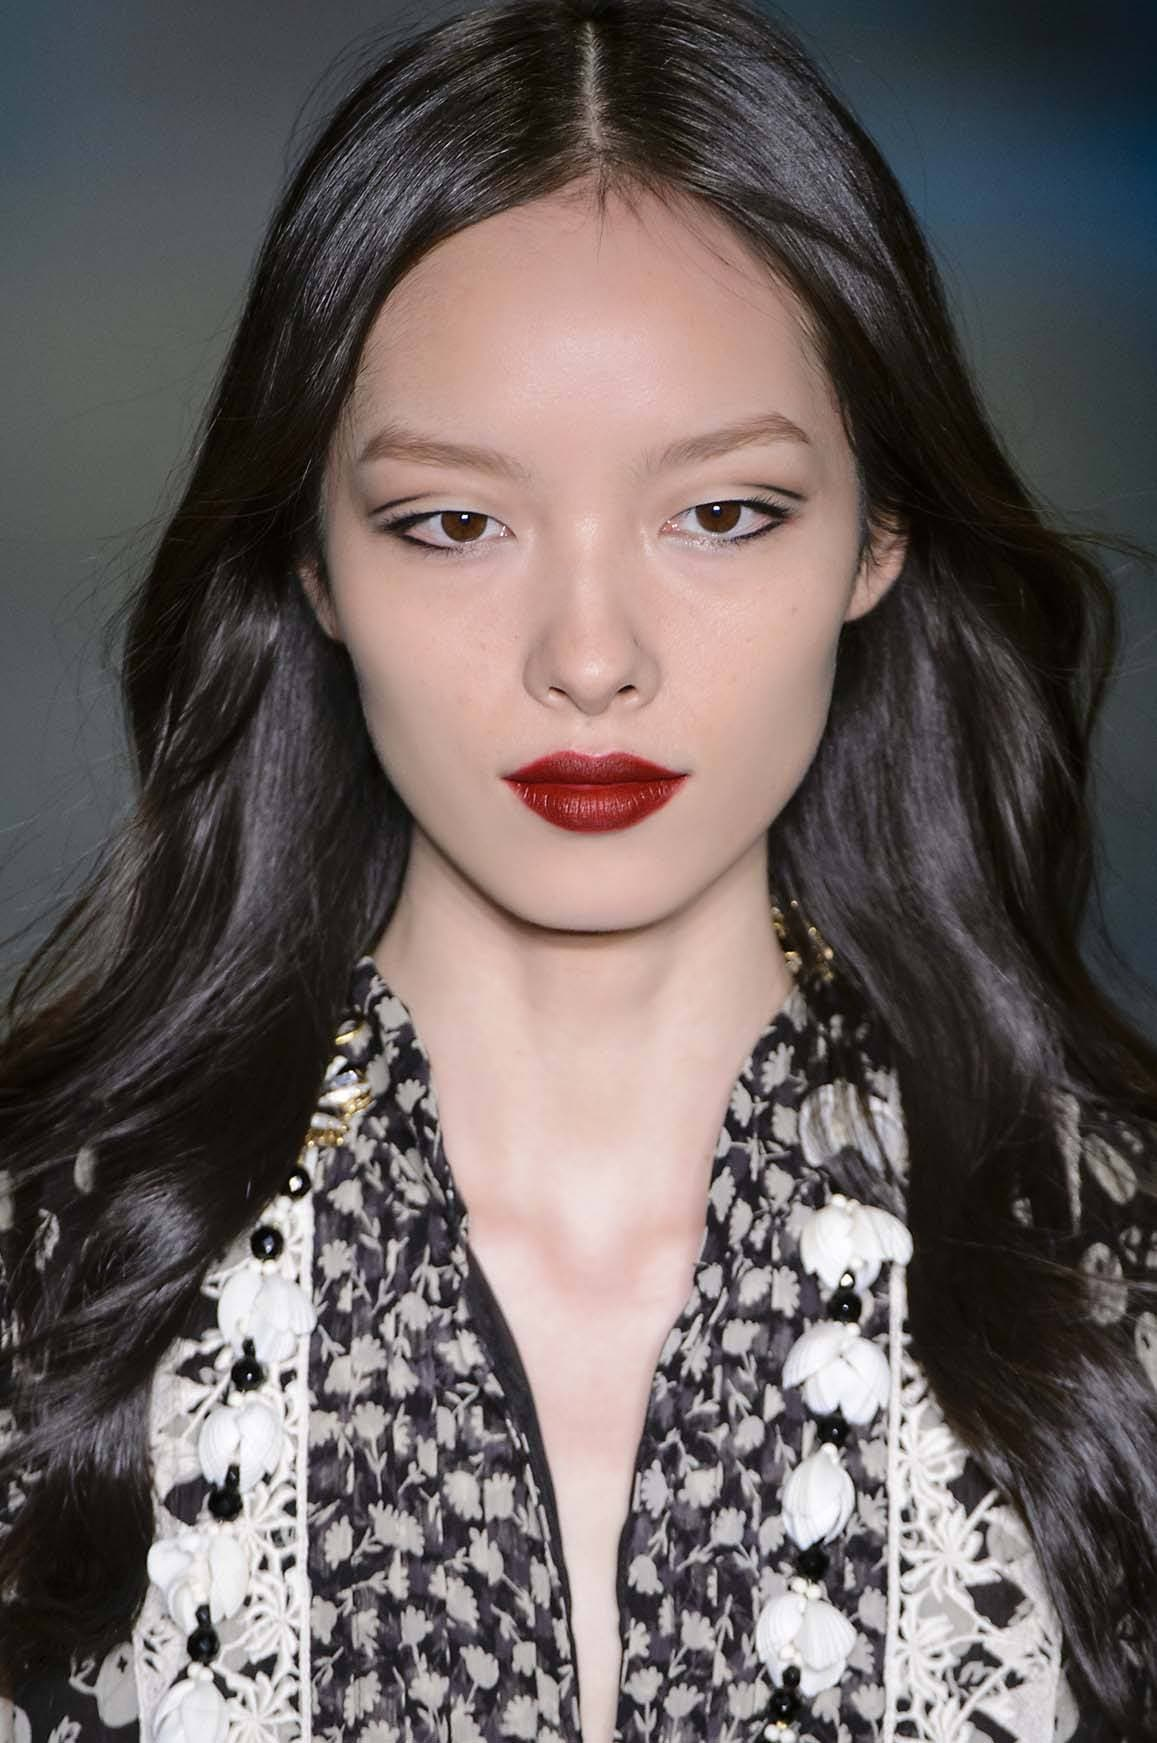 Hair glossing: glossy black asian hair